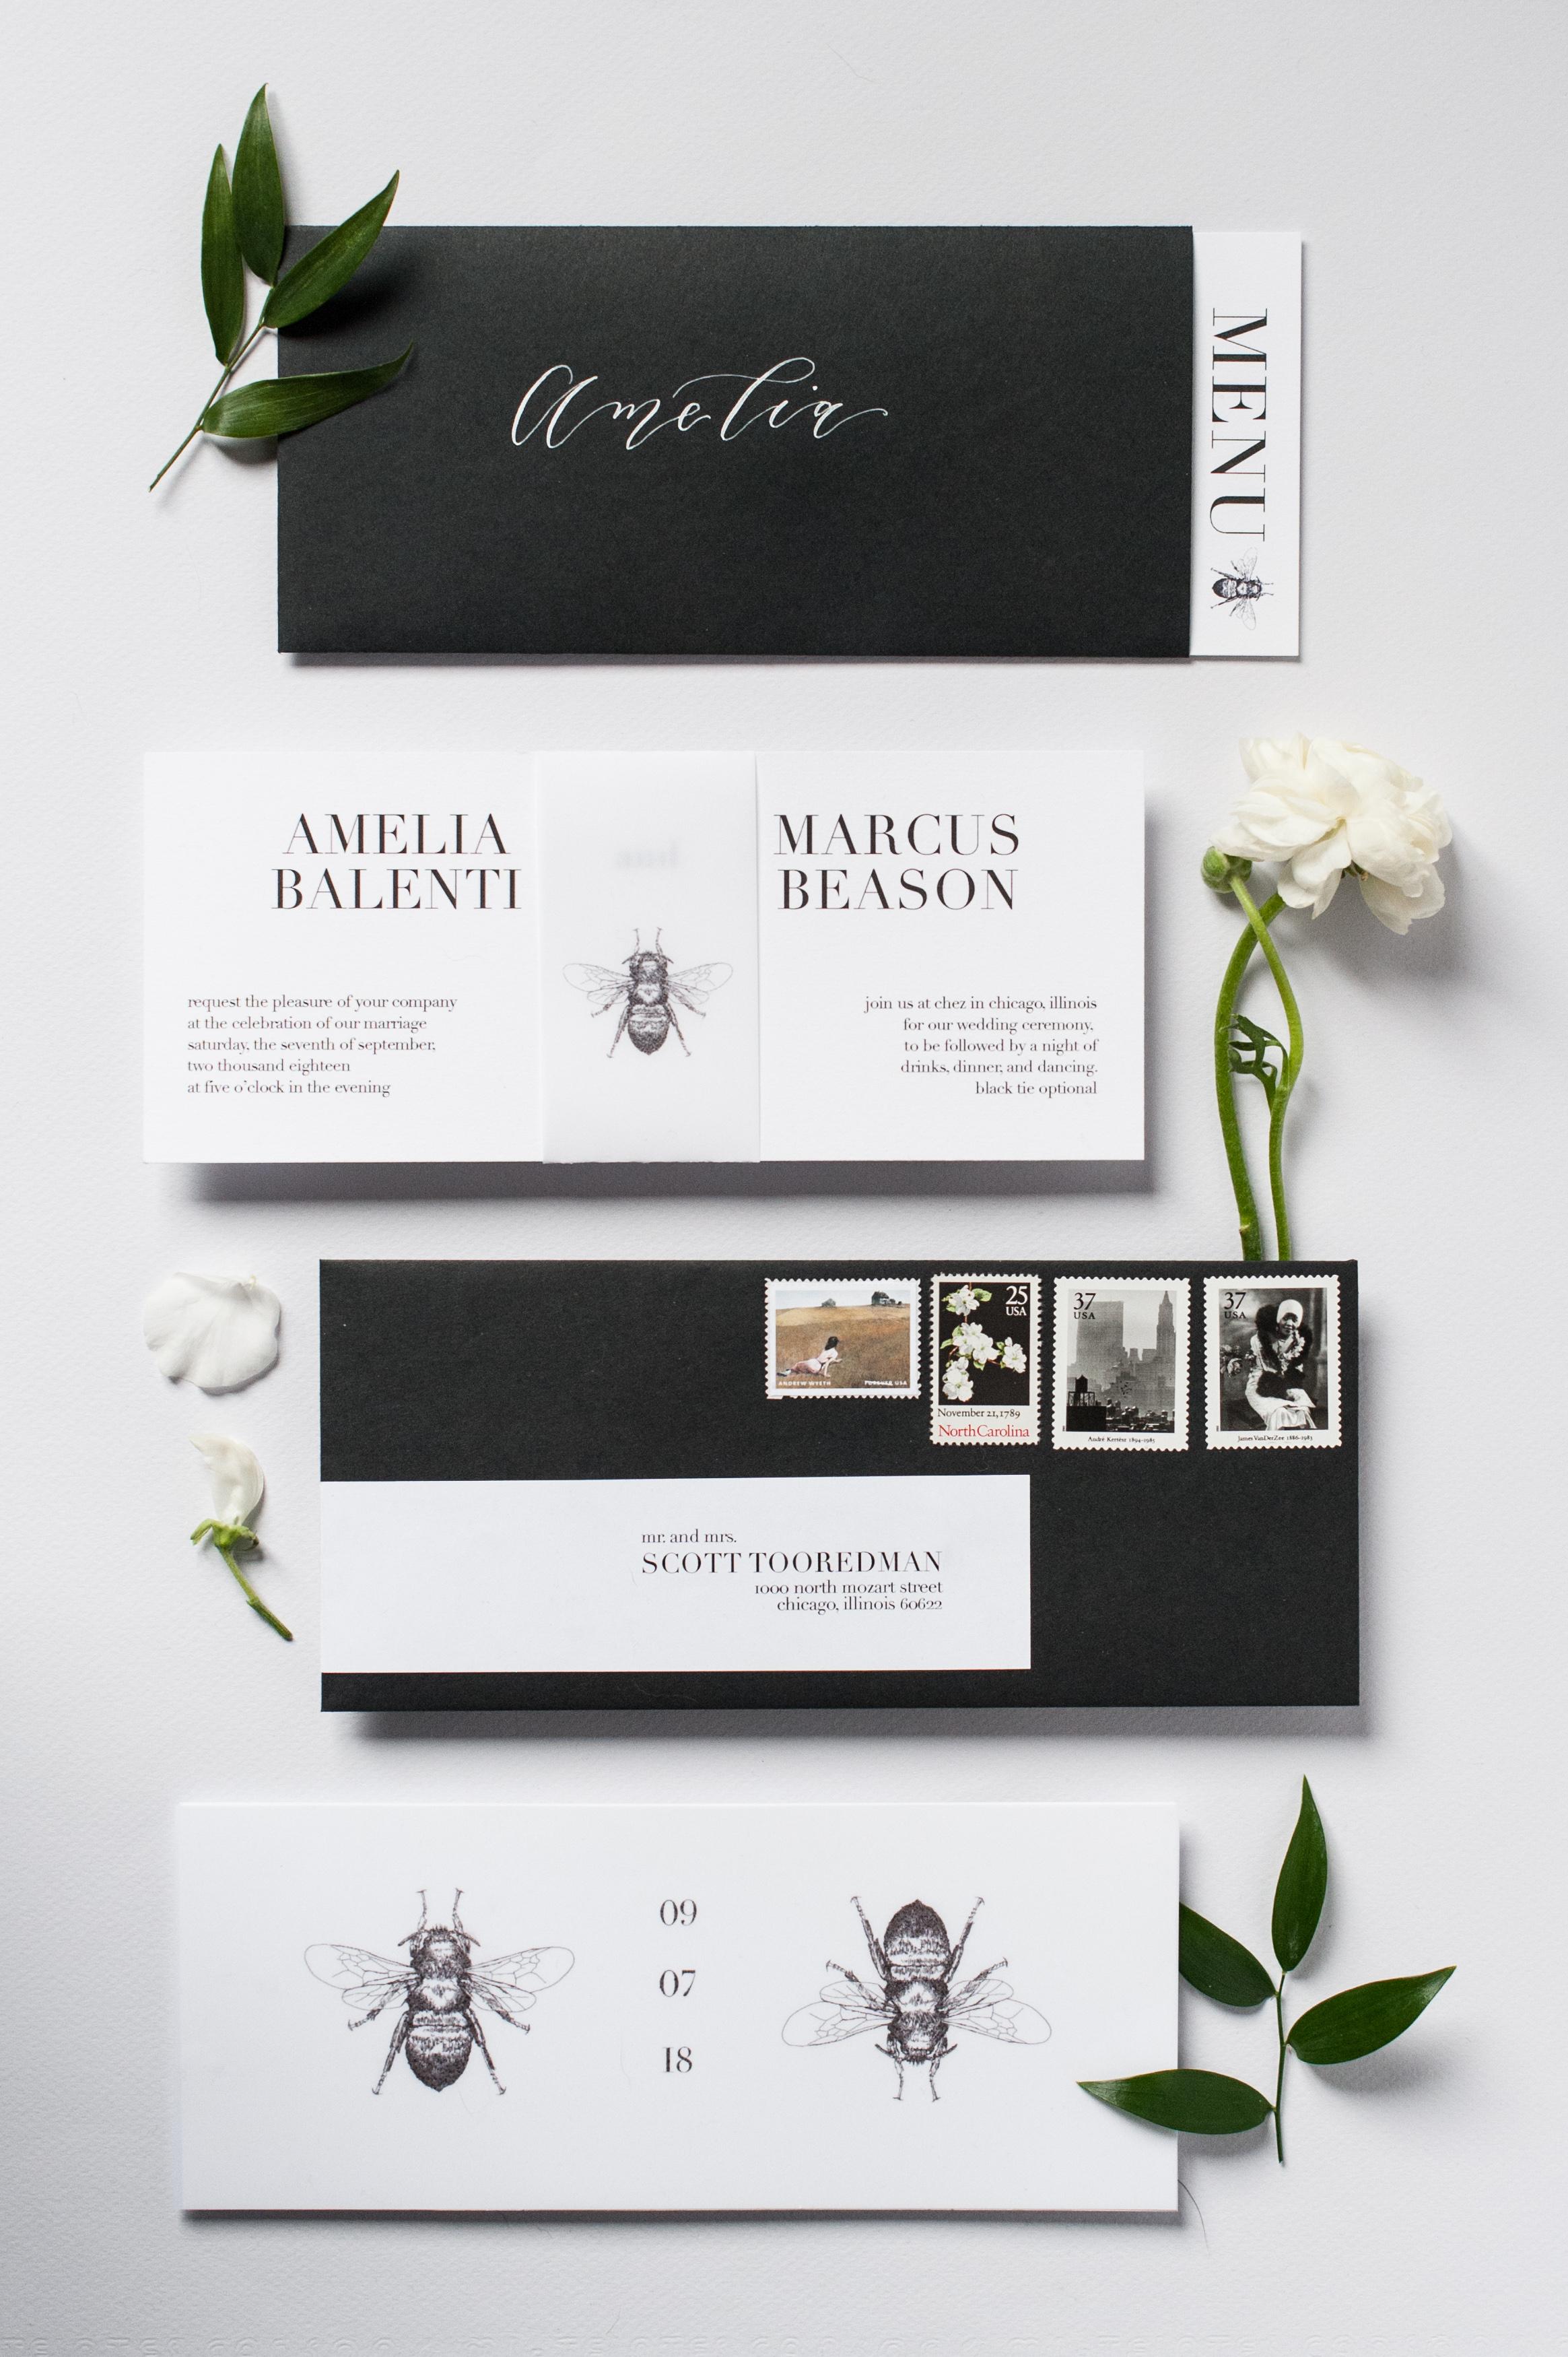 black and white wedding invitation with envelope